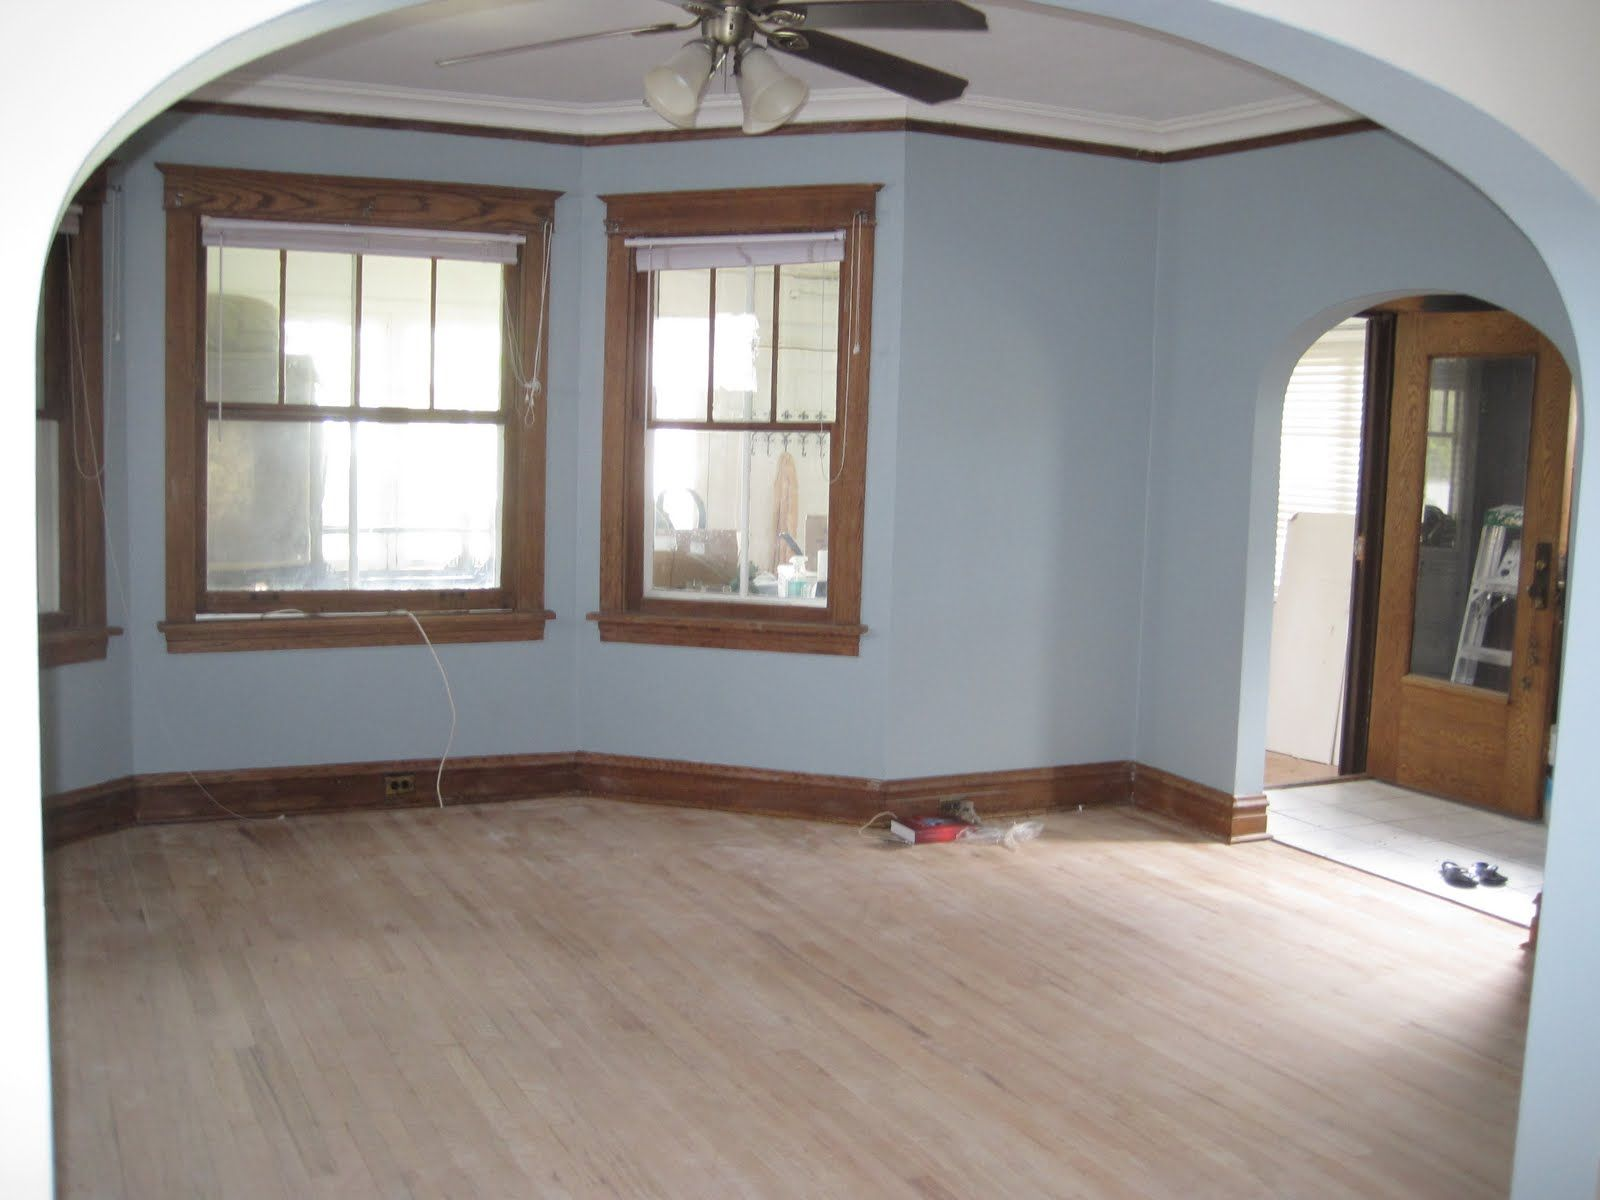 Living Room Paint Ideas With Dark Wood Trim living room paint ideas with wood trim